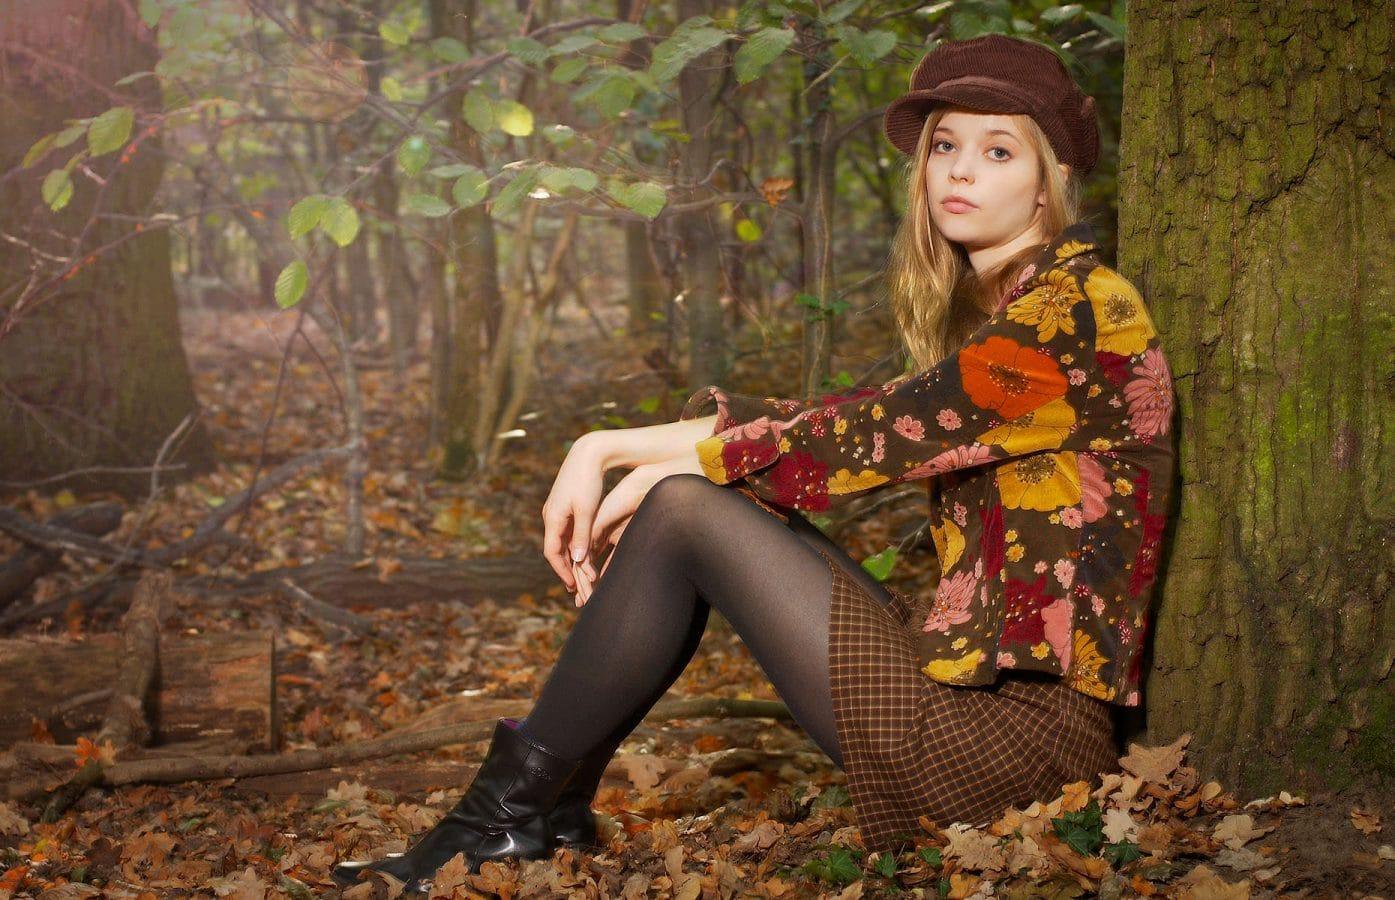 Autumn Fashion by ChristophGerlach on DeviantArt